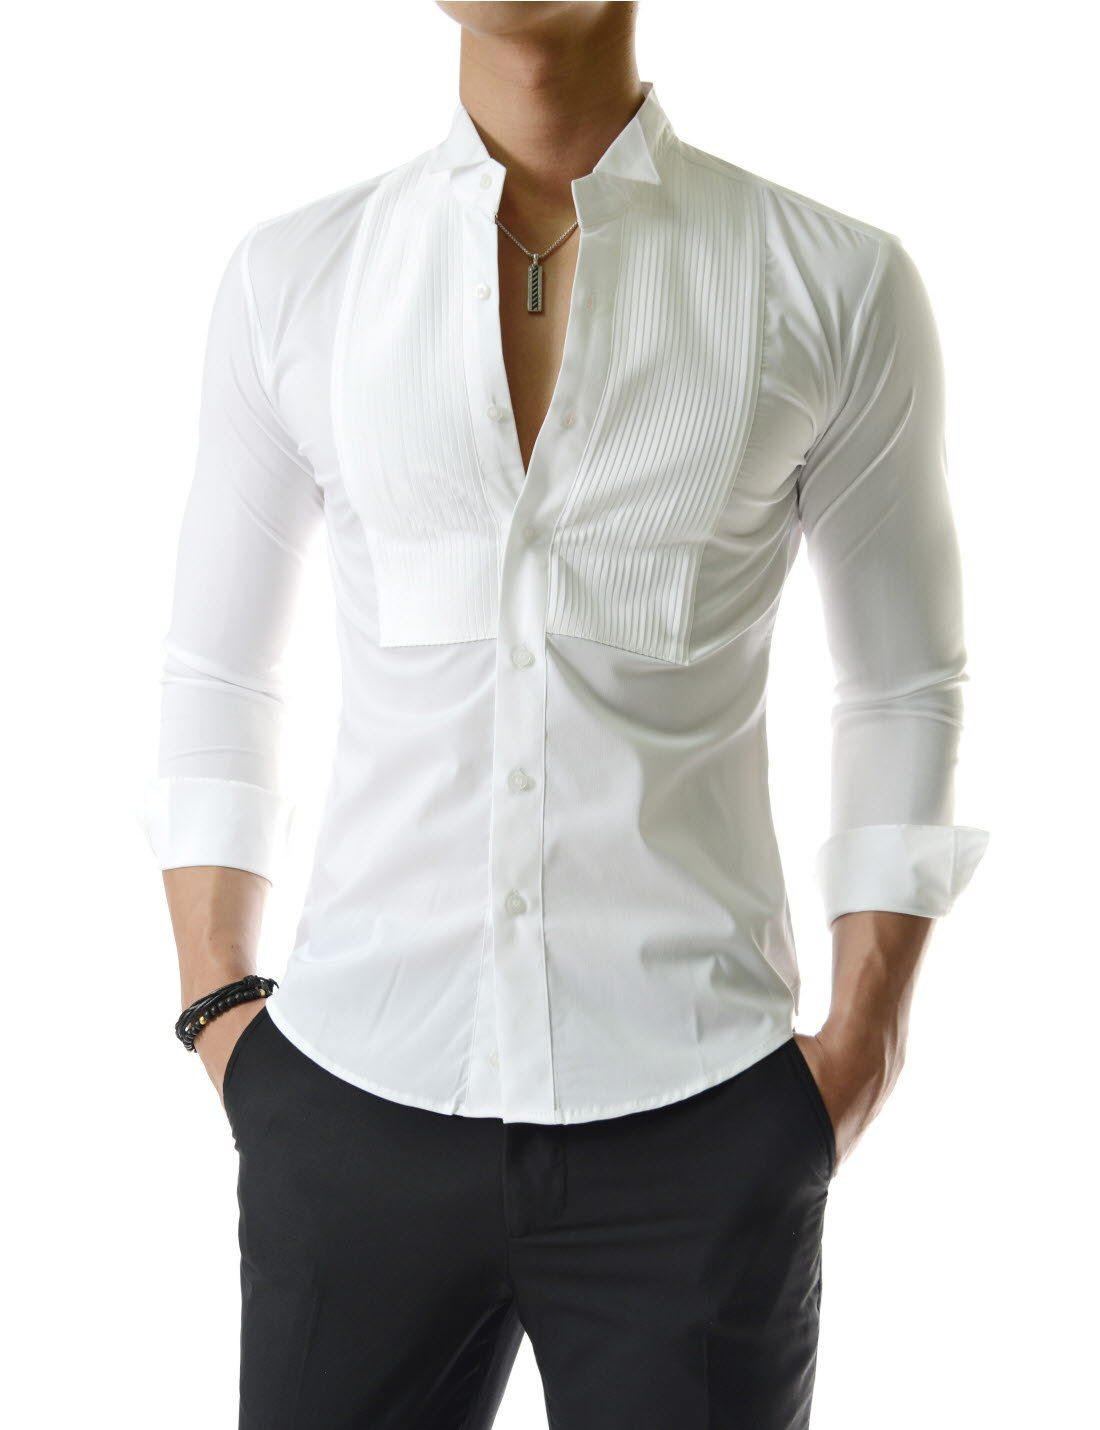 Fashionable tuxedo slim wing collar pintuck long sleeve dress shirts